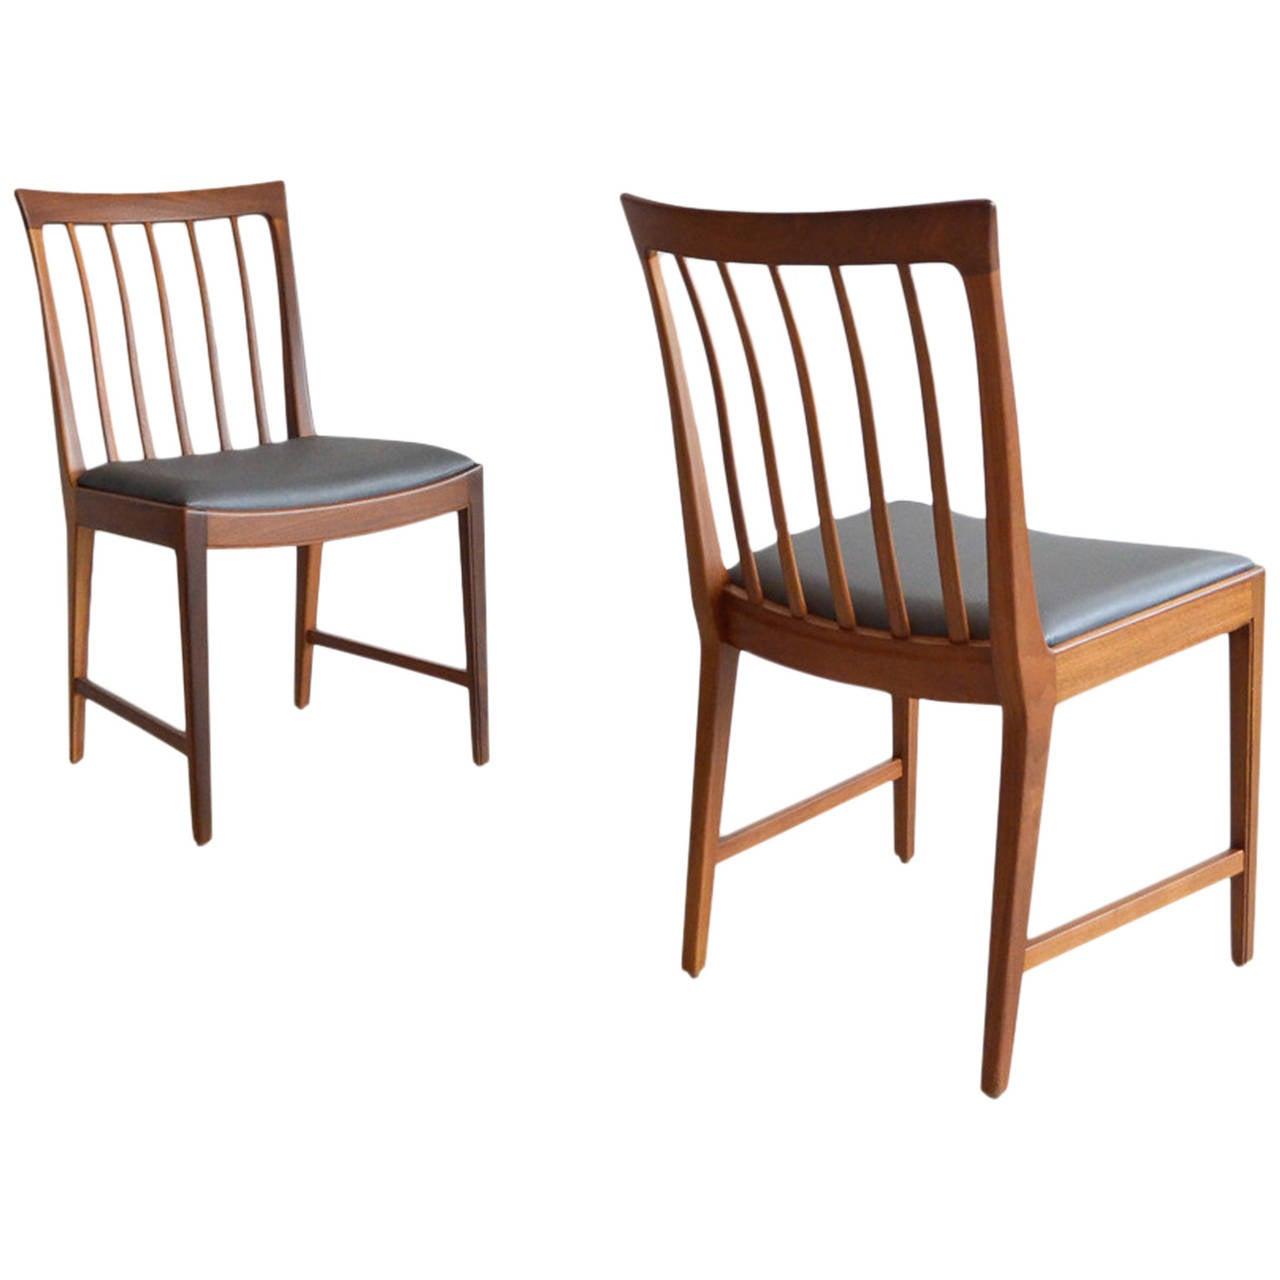 Slat Back Chairs pair of walnut slat back chairsmm moreddi sweden at 1stdibs